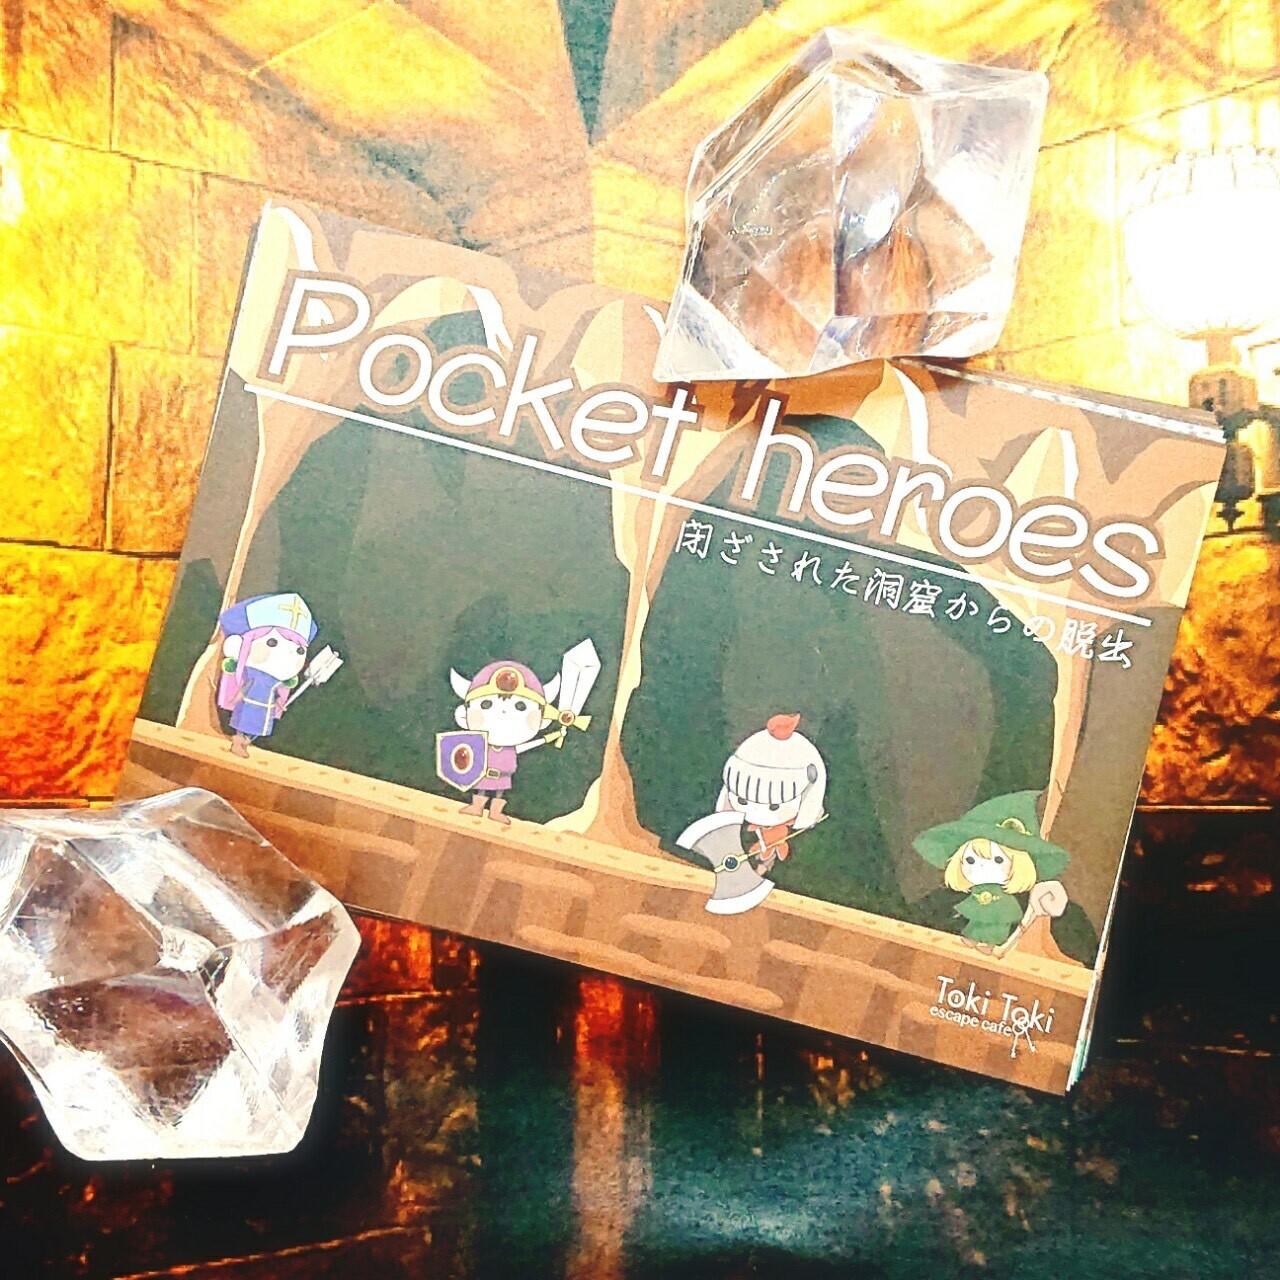 Pocket  heroes ポケットヒーローズ『閉ざされた洞窟からの脱出』